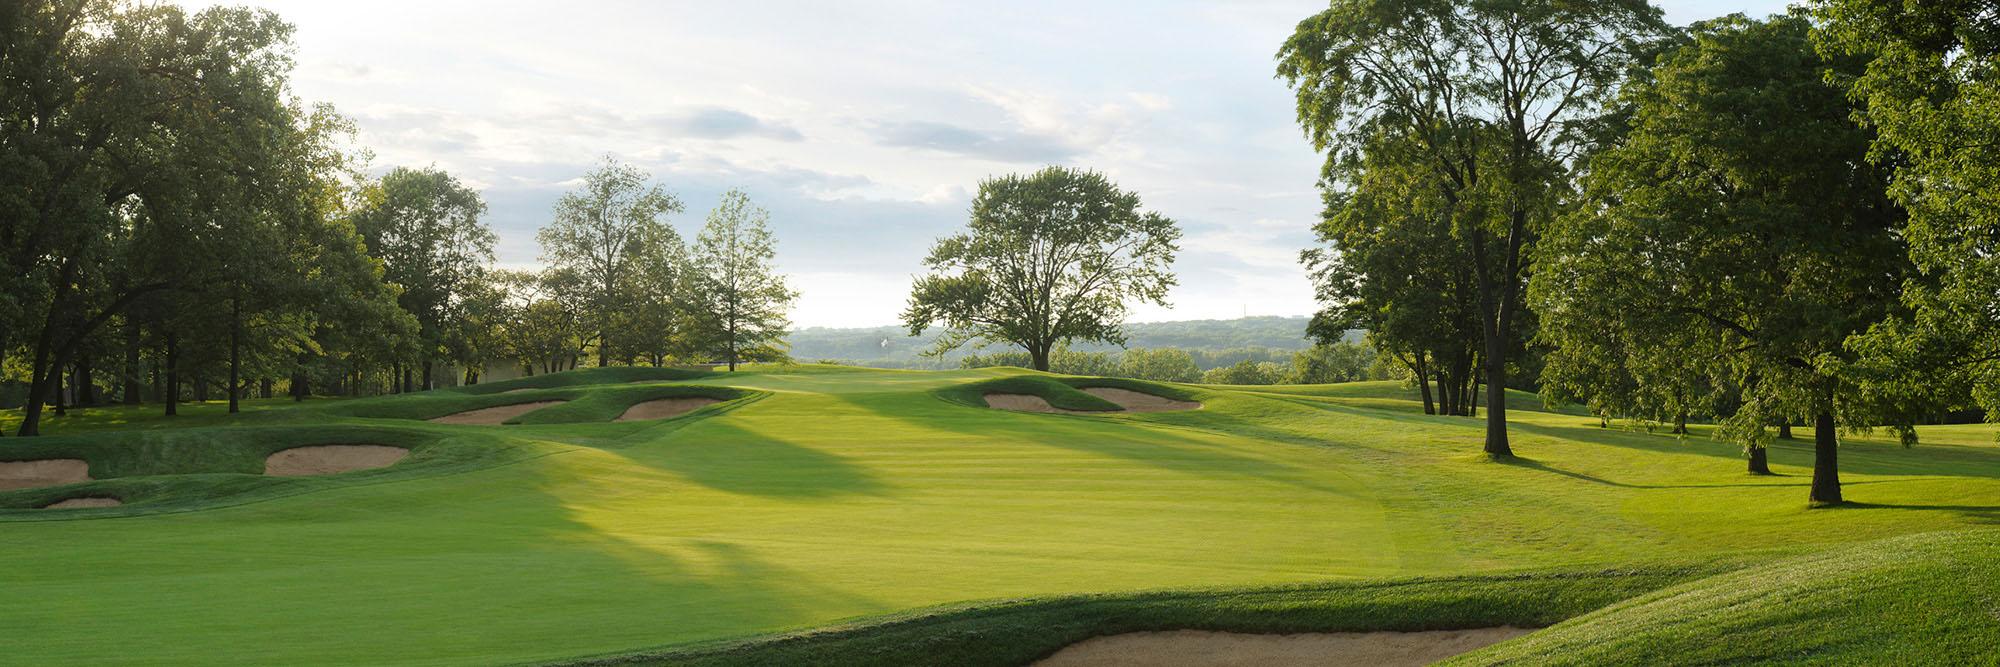 Golf Course Image - Cog Hill 4 No. 11